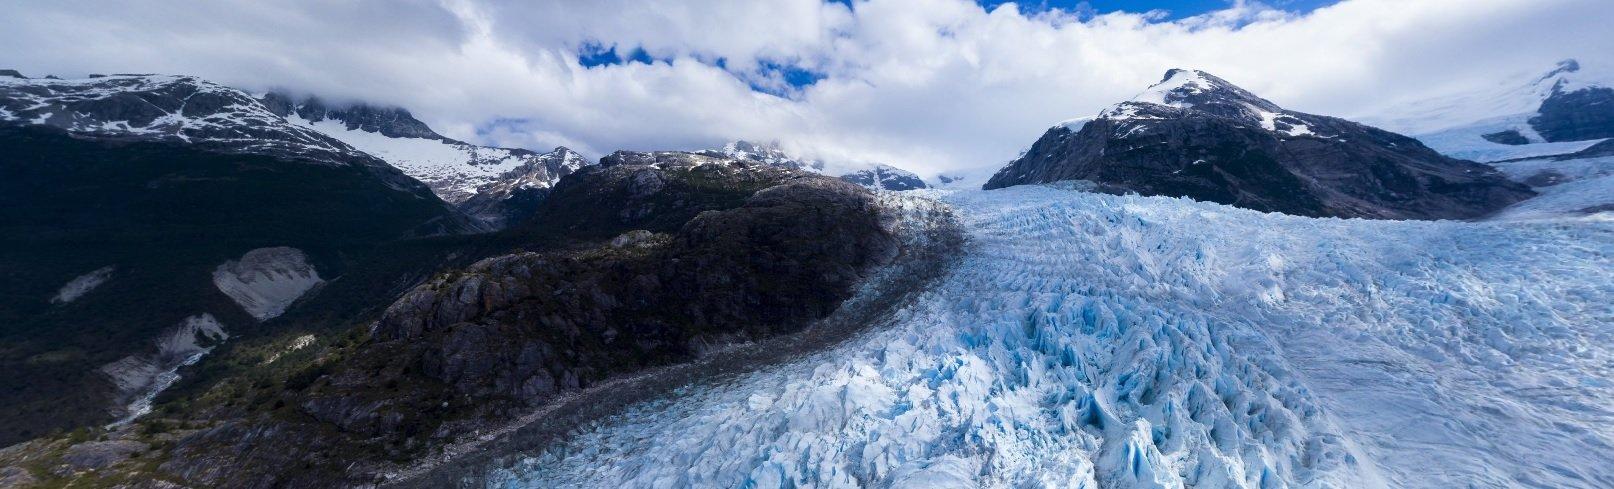 Piękne zdjęcia 180 stopniowe z Dji mavic air